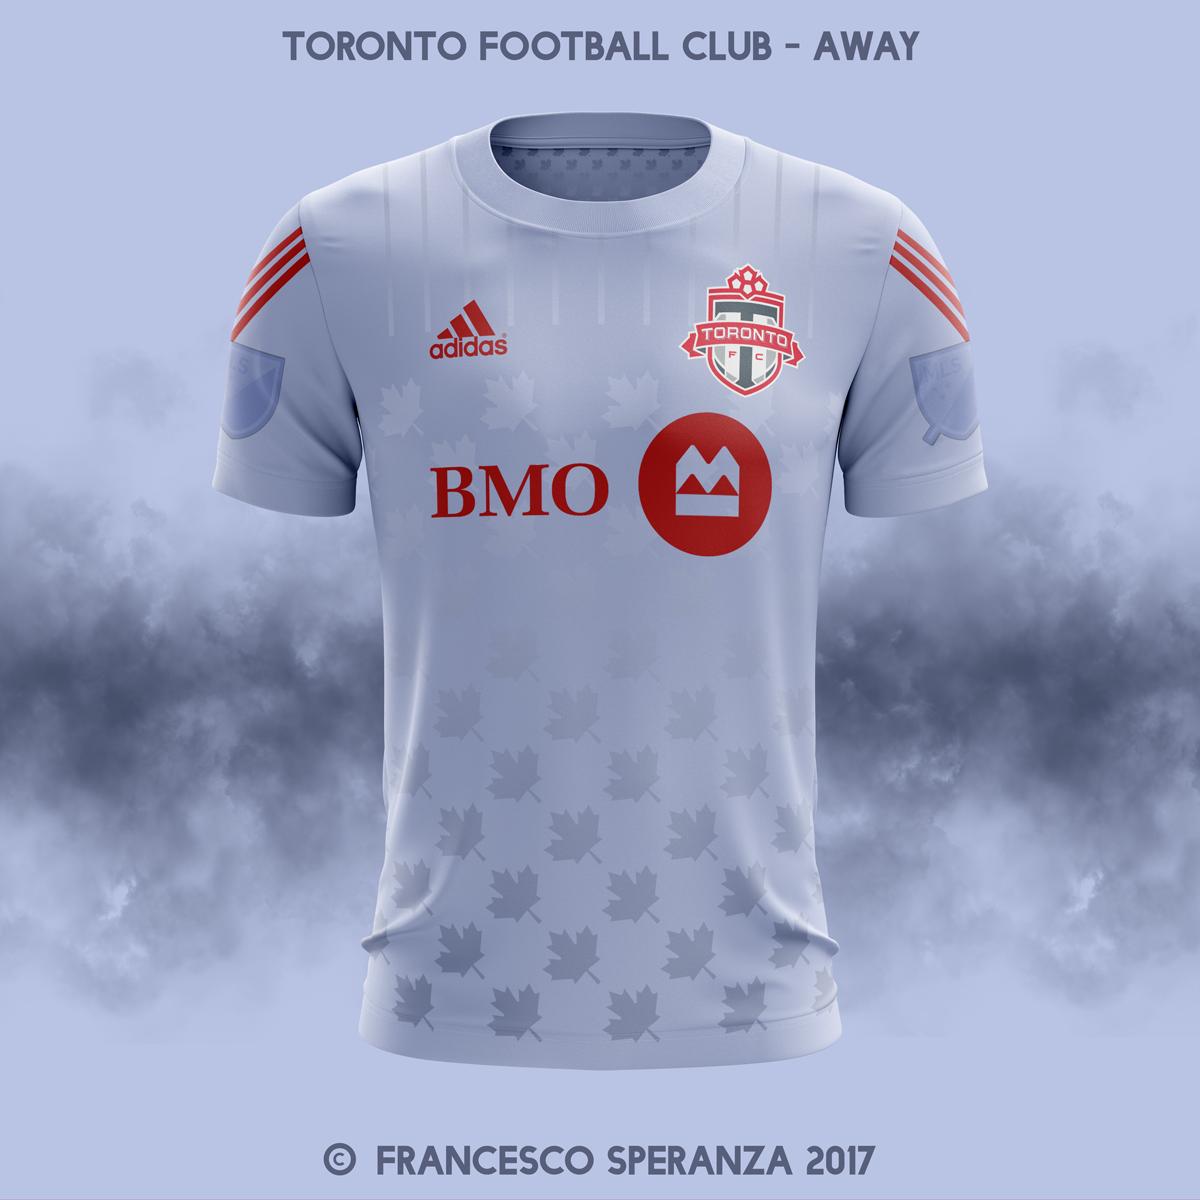 hot sale online efad6 b0201 Toronto Football Club - home & away 2018/2019 MLS on Behance